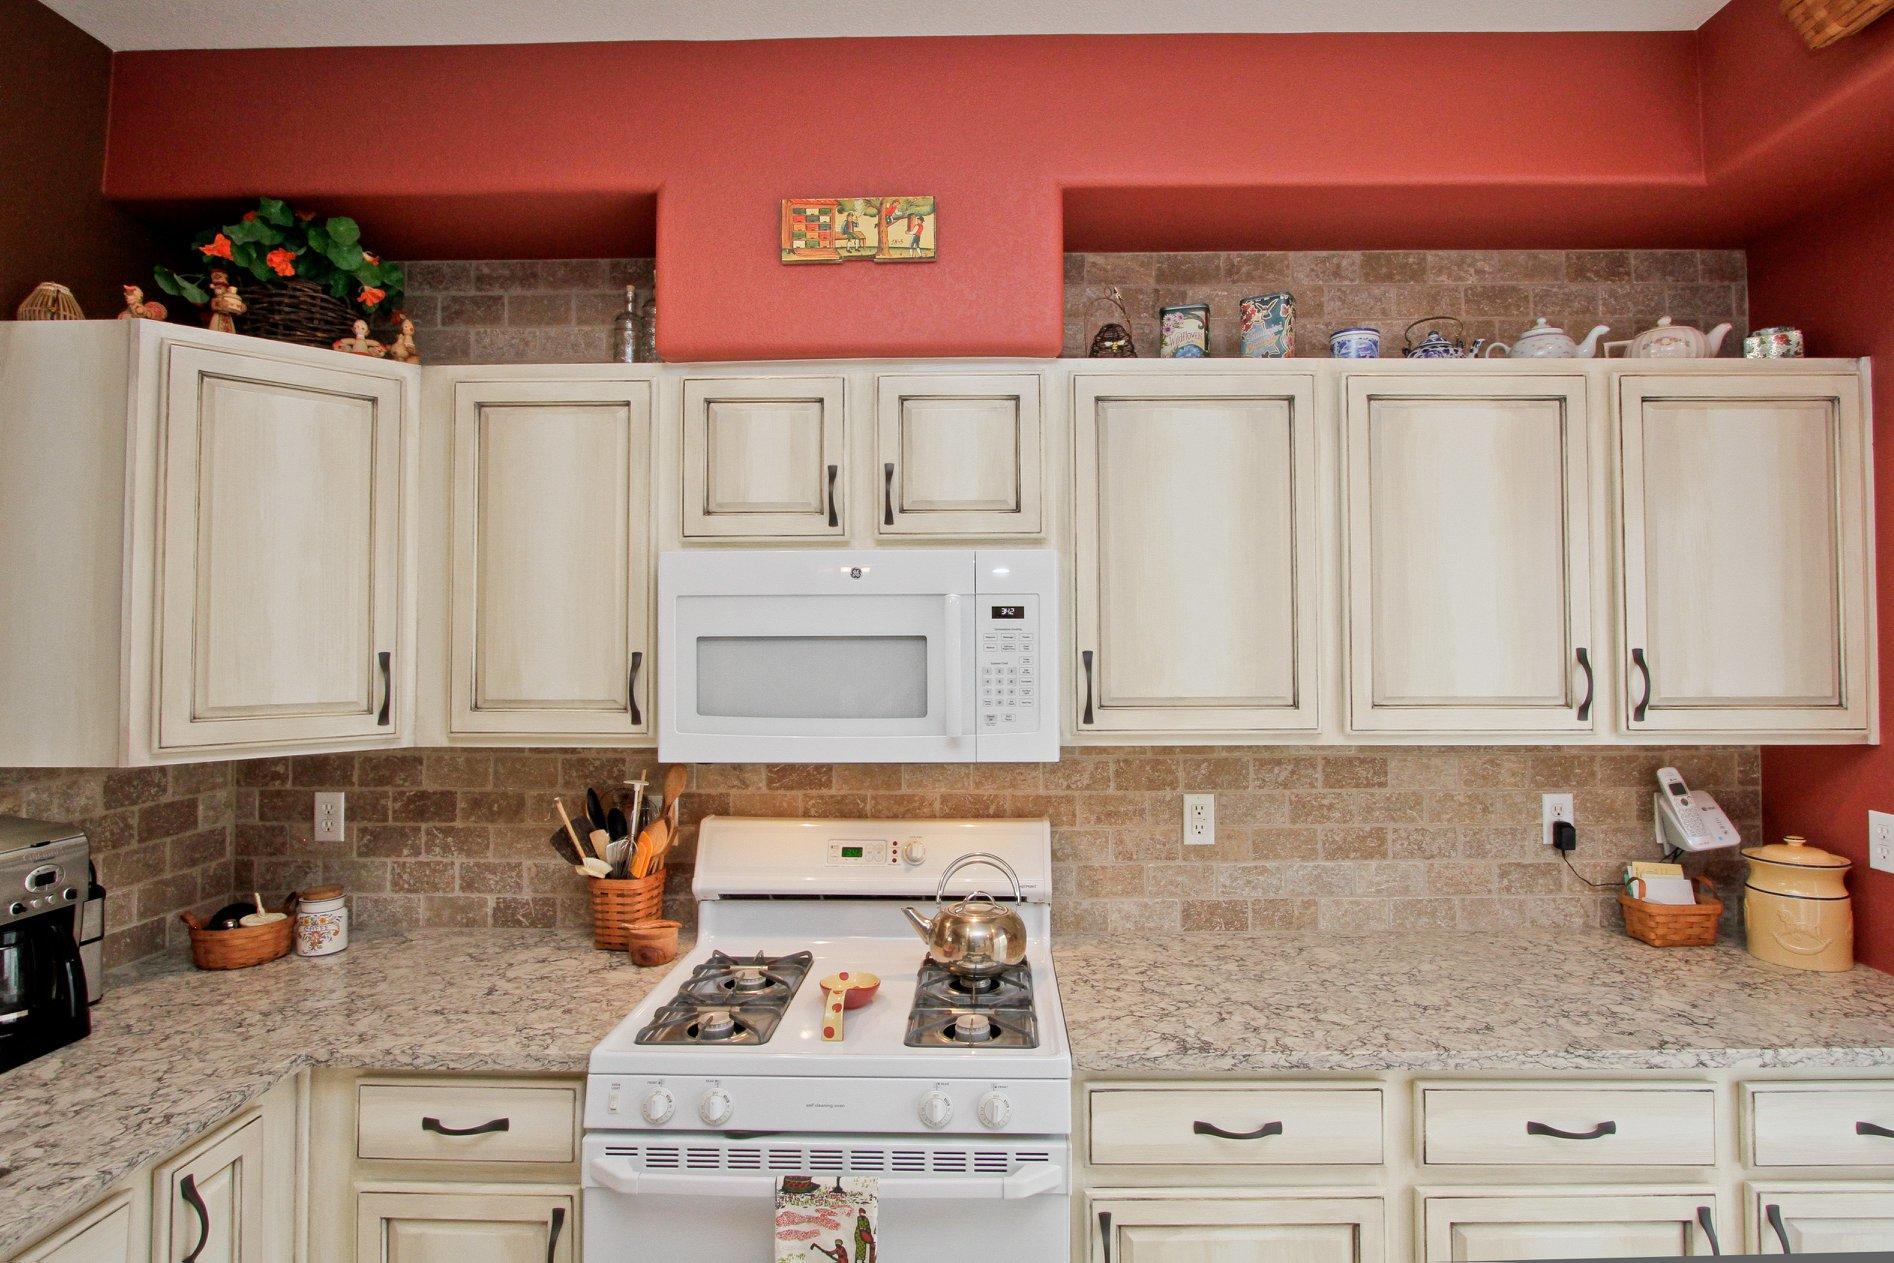 Cress Kitchen And Bath Wheat Ridge Co Dandk Organizer